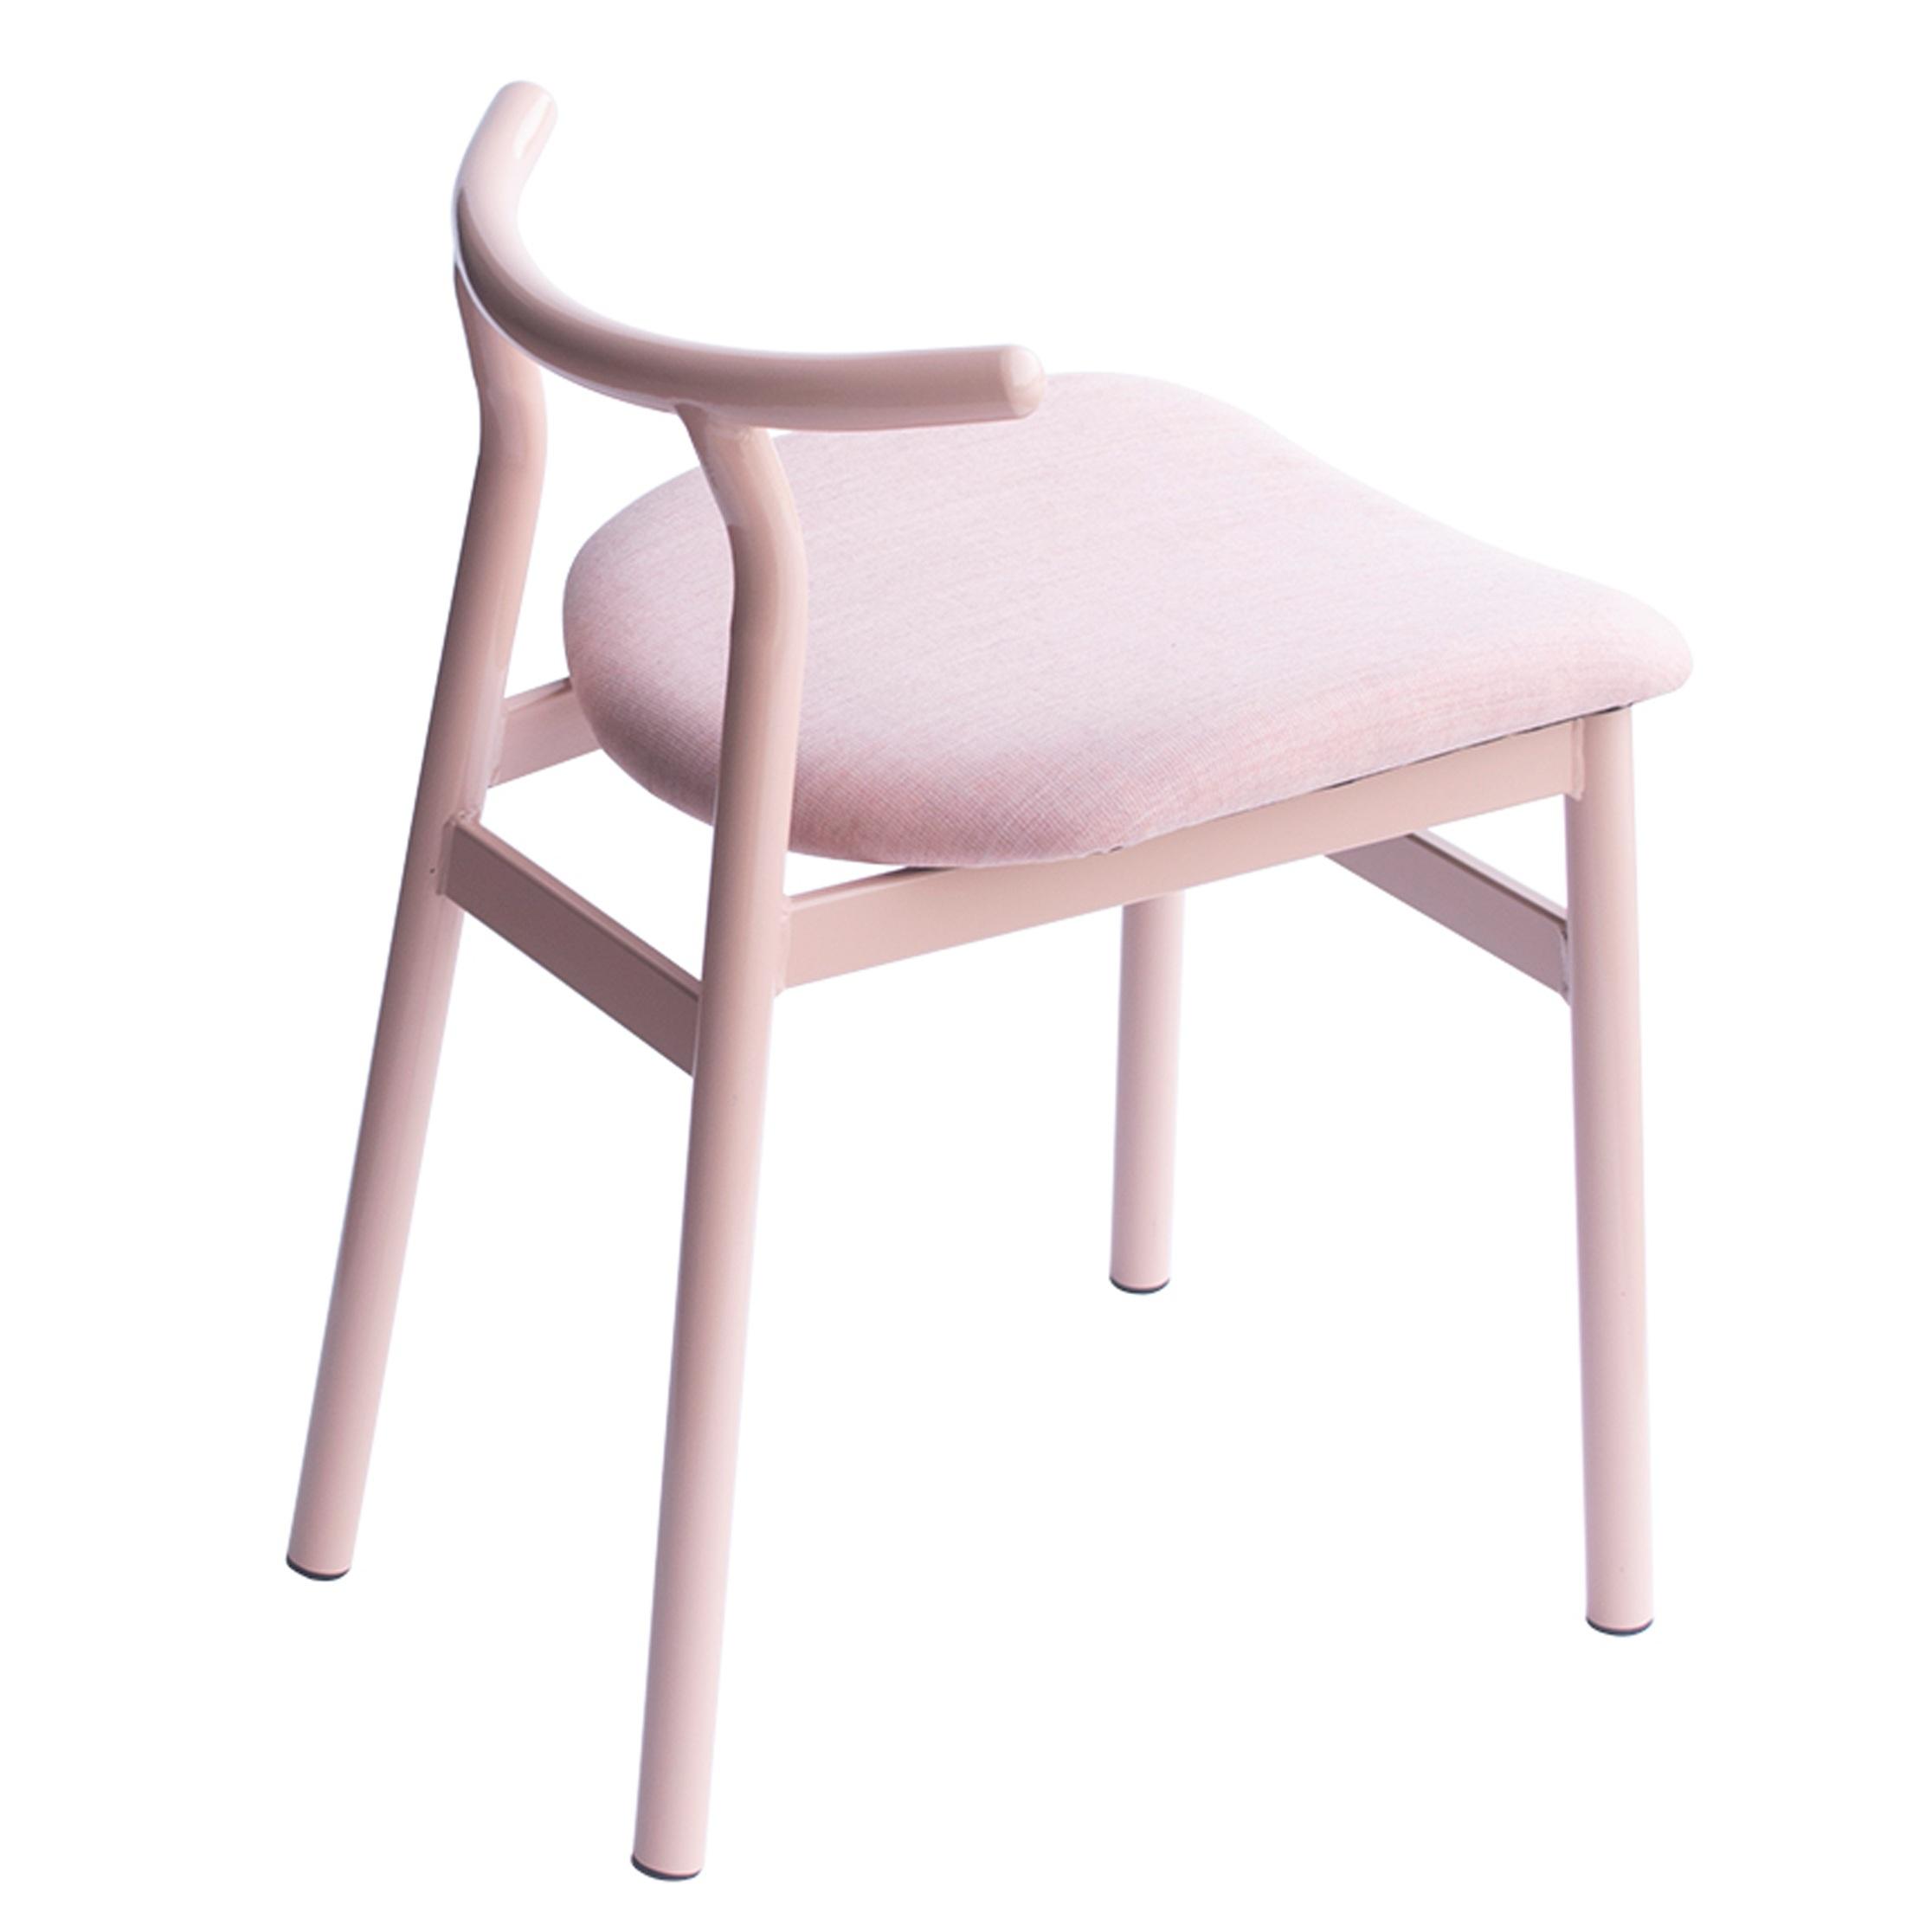 L21 Brat Chair